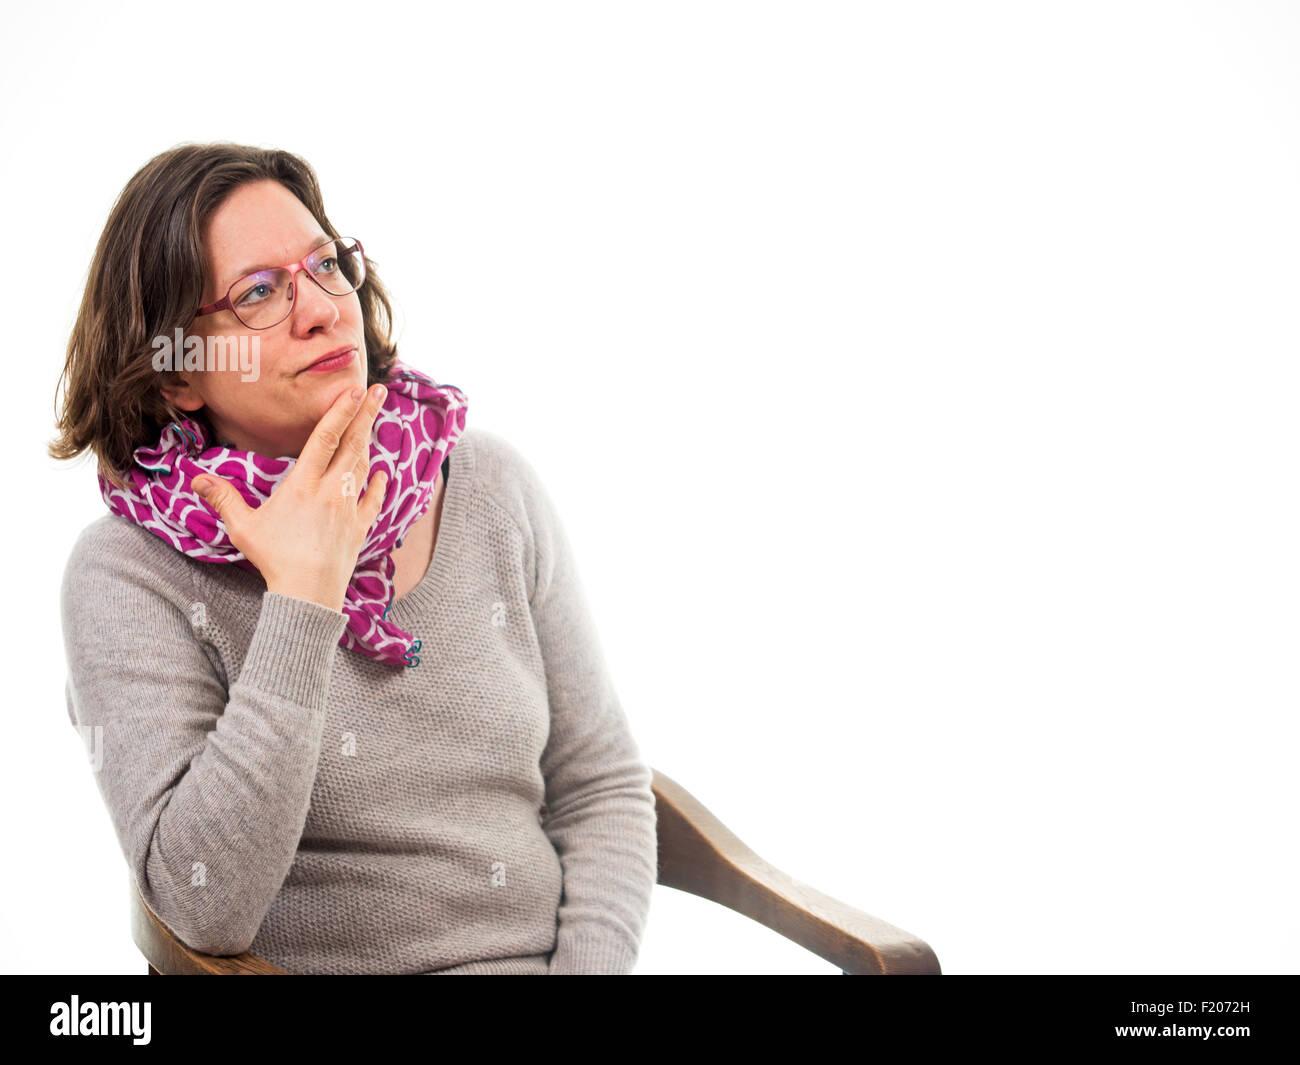 Frau denkt nach - Stock Image